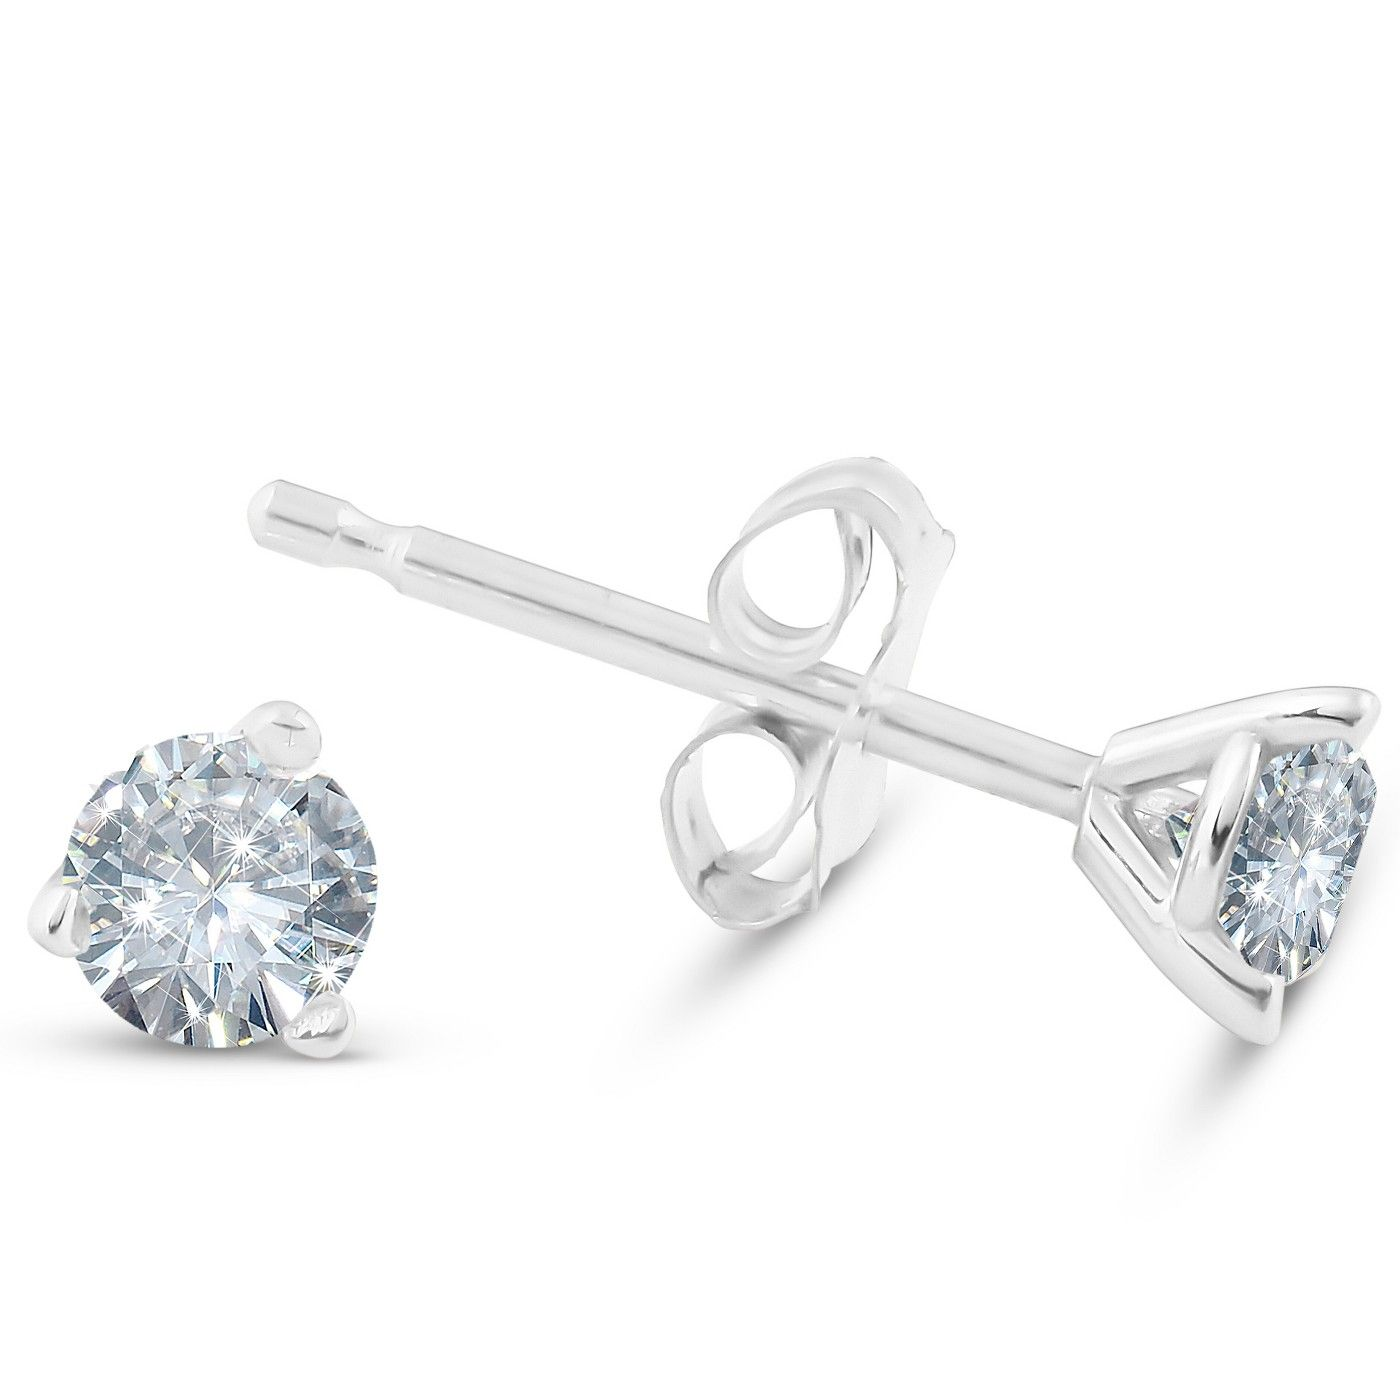 Pompeii3 1 4 Ct Tdw Round Lab Created Diamond Studs In Platinum 14k White Or Yellow Gold Affiliate Diamond Studs Grown Diamond Diamond Earrings Studs Round